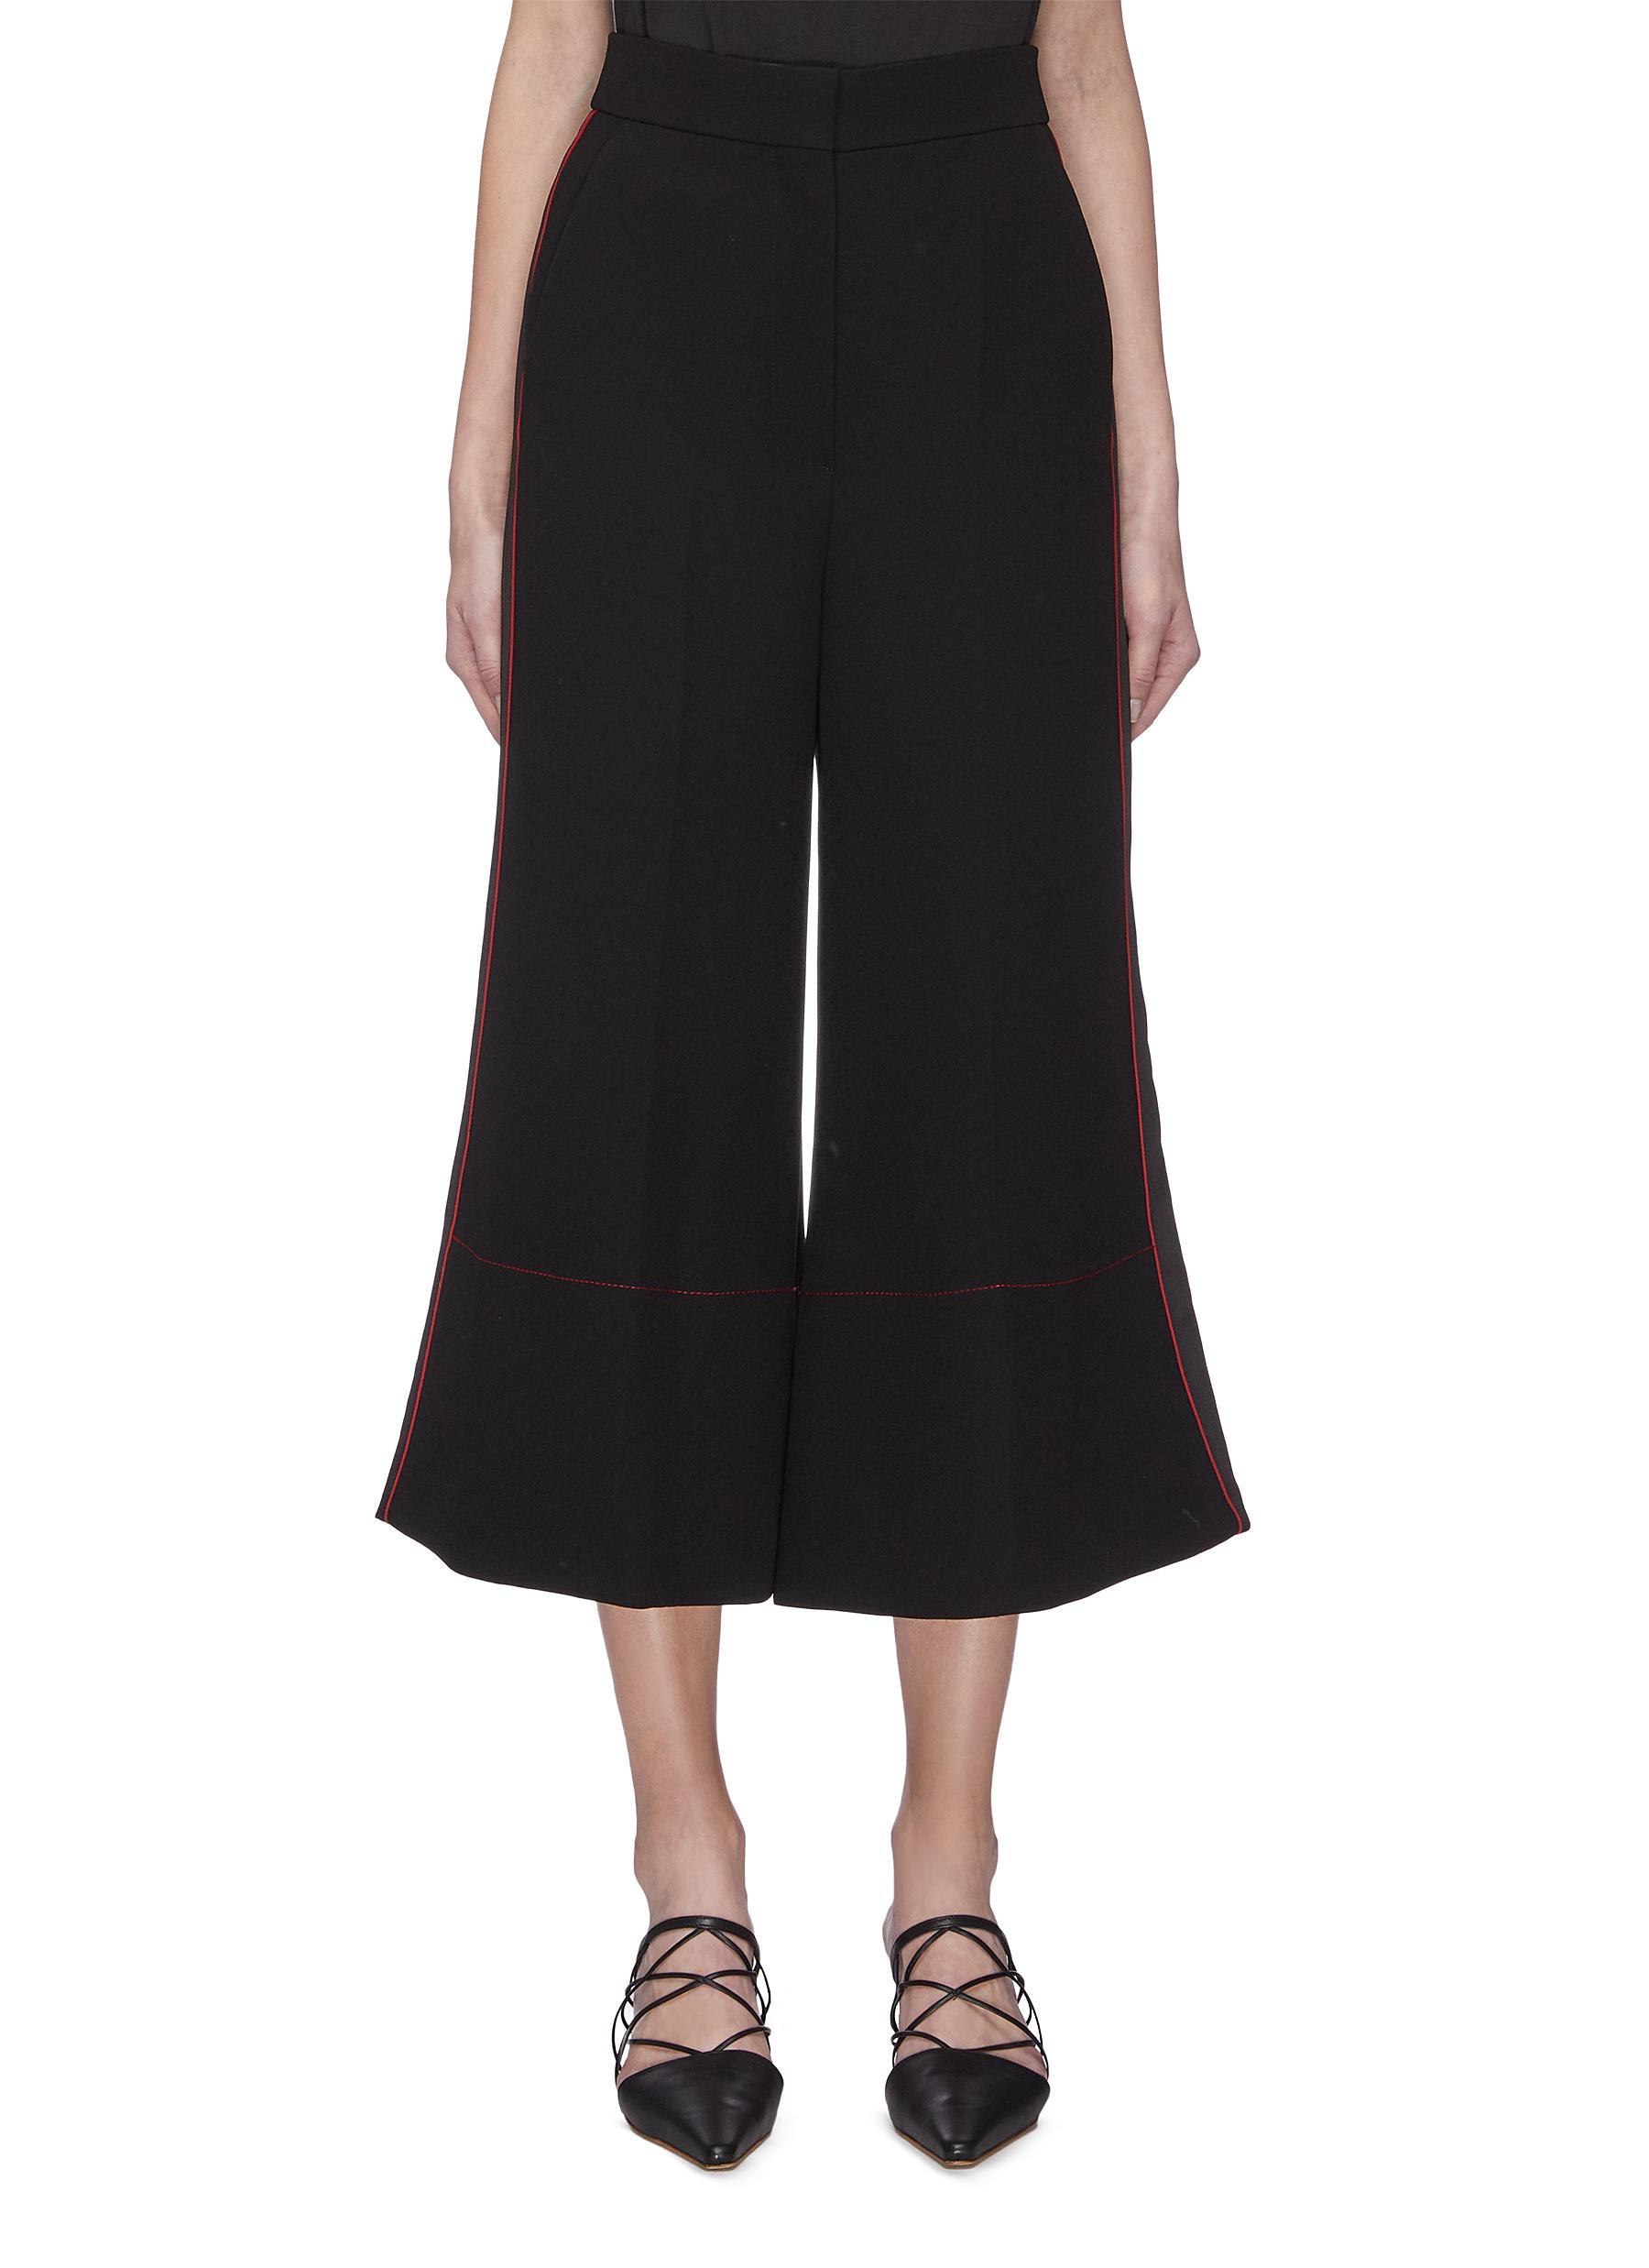 Buy Roksanda Pants & Shorts 'Hasani' wild leg pants